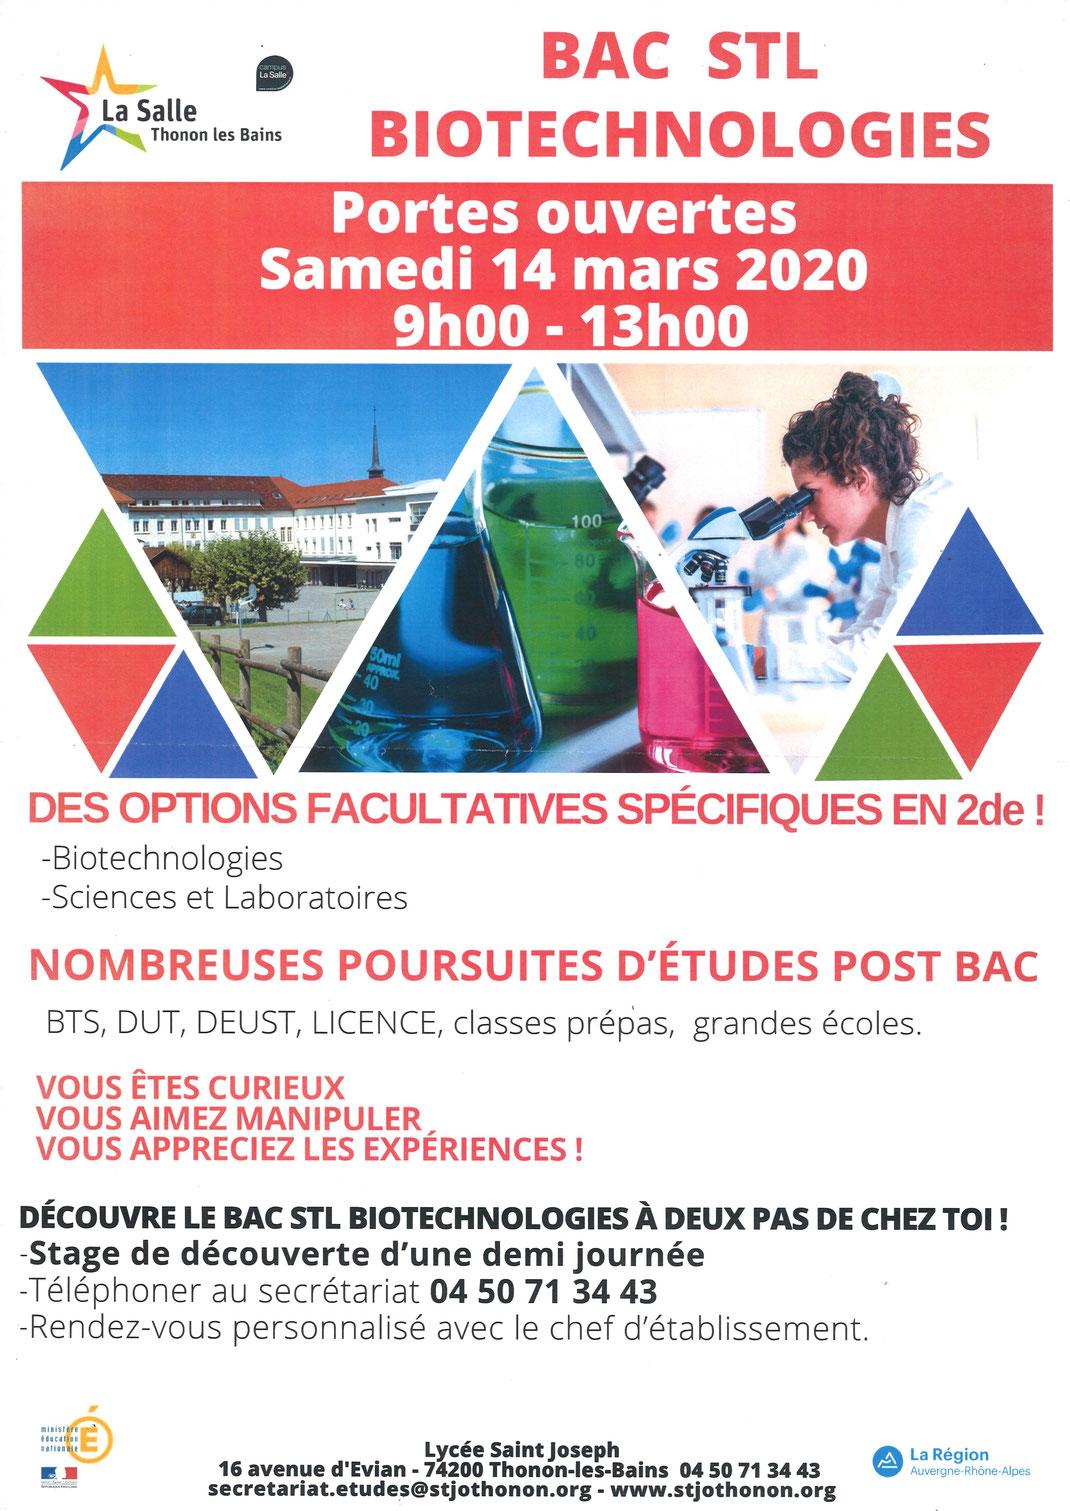 La Salle / Saint Joseph Thonon-les-Bains - BAC STL Biotechnologies - Portes ouvertes: Samedi 14 Mars 2020 09:00-13:00  Lycée Saint Joseph - 16 avenue d'Evian - 74200 Thonon-les-Bains  04 50 71 34 43 | secretariat.etudes@stjothonon.org | www.stjothonon.or